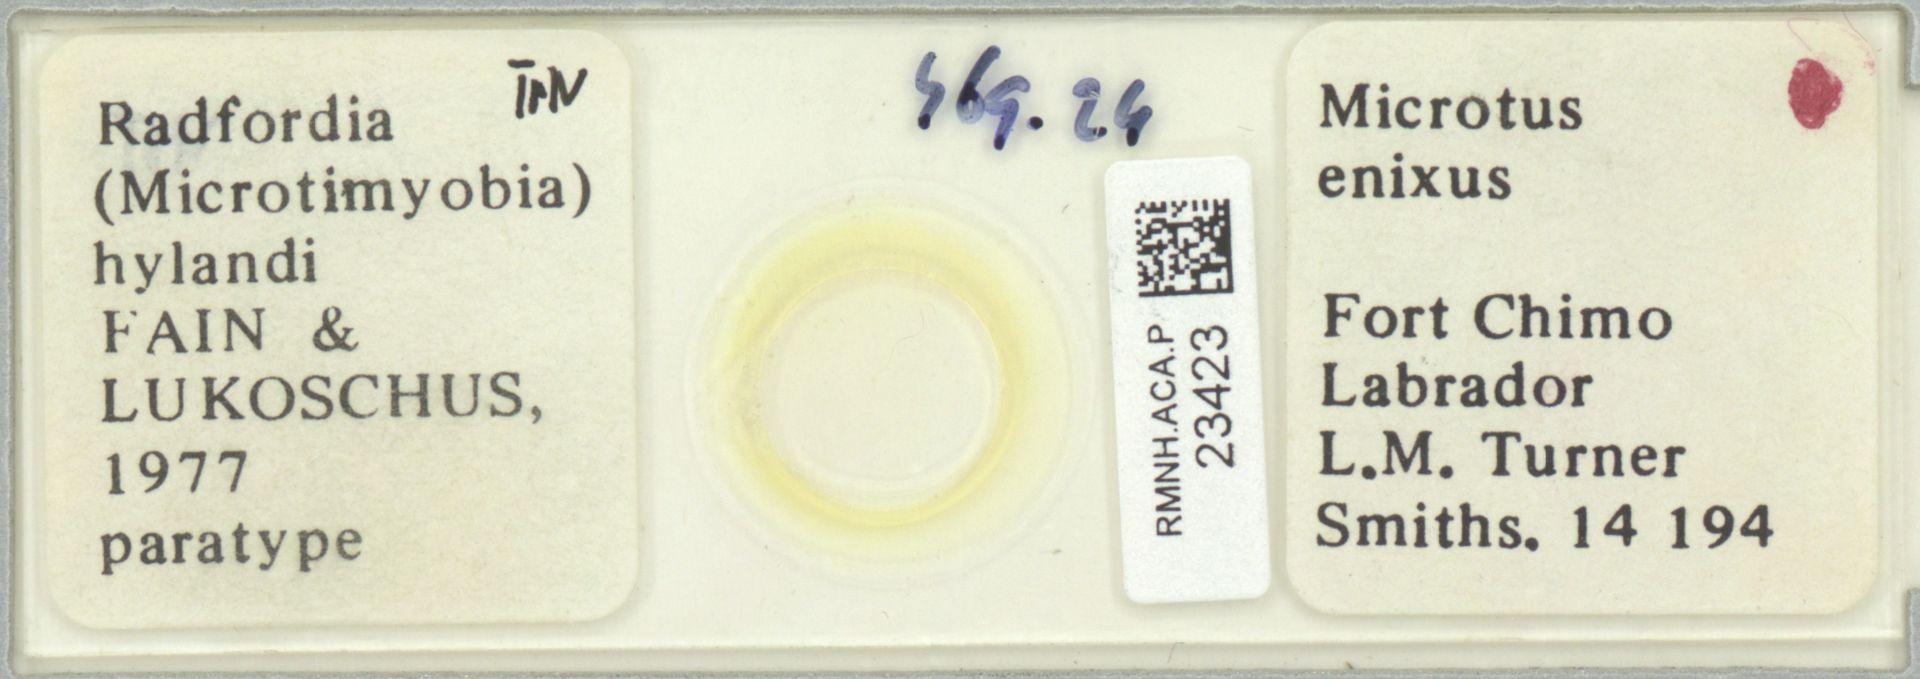 RMNH.ACA.P.23423   Radfordia (Microtimyobia) hylandi Fain & Lukoschus 1977